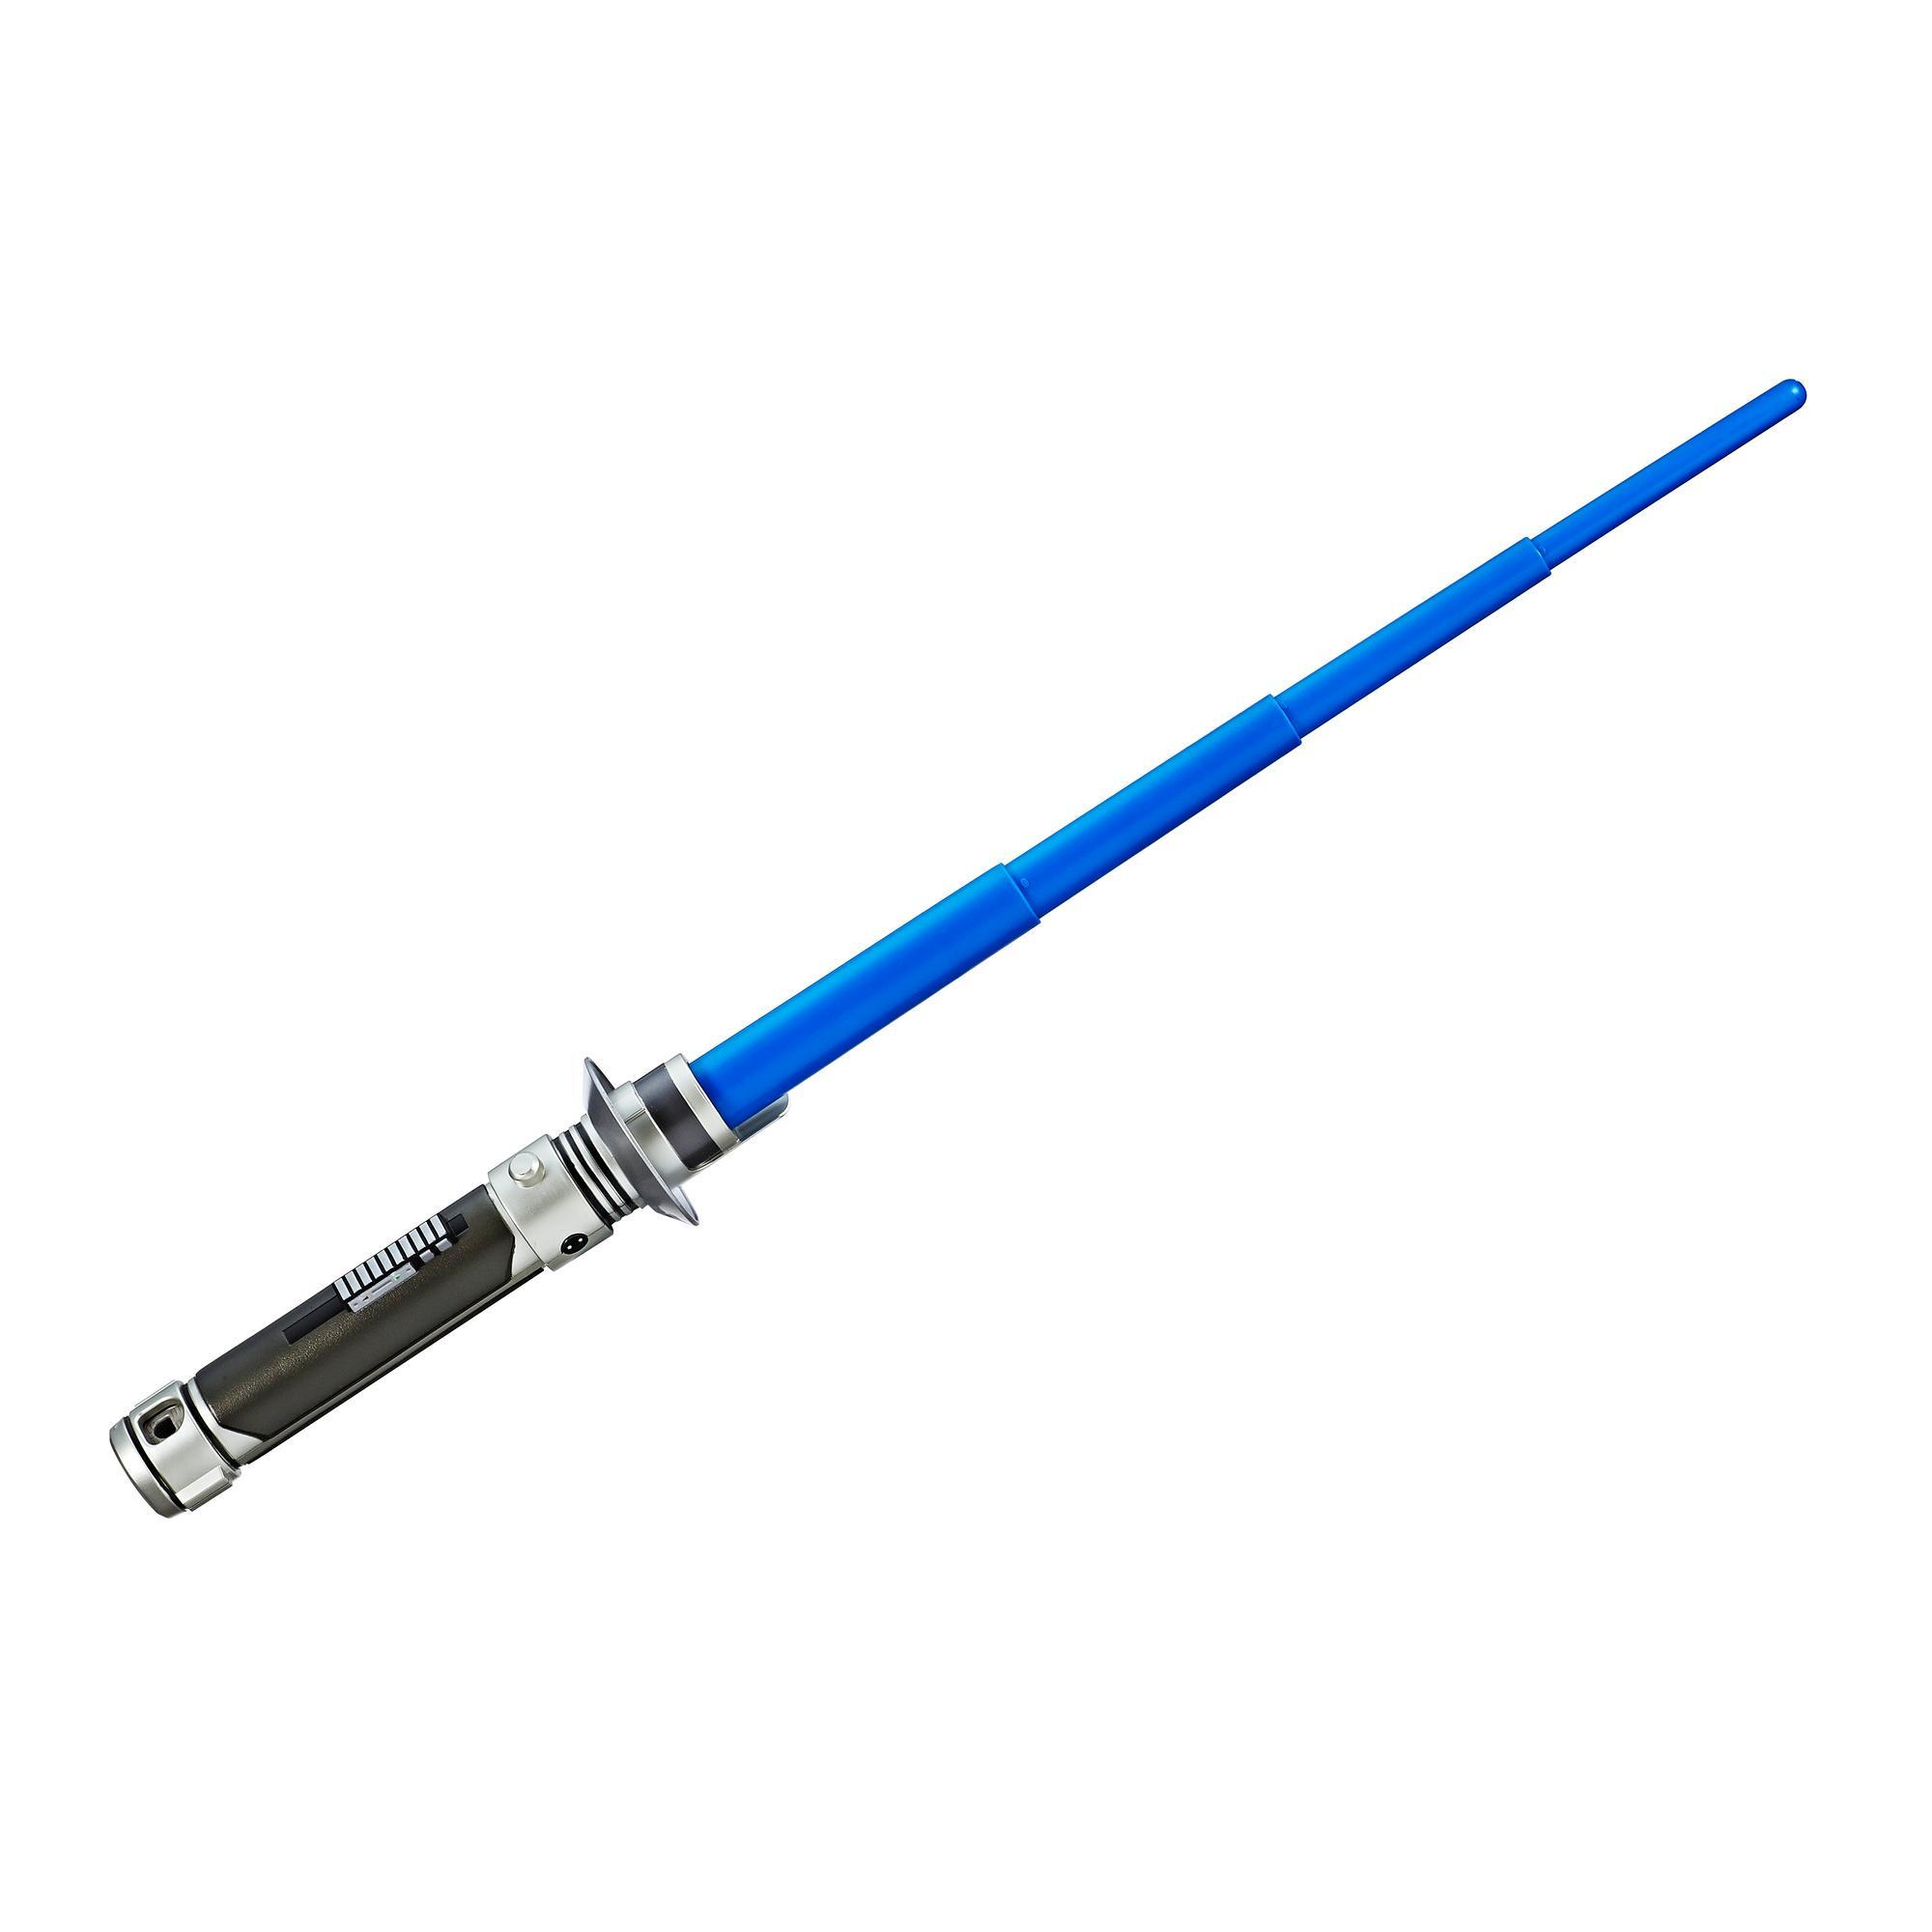 Star Wars Rebels Kanan Jarrus Extendable Lightsaber